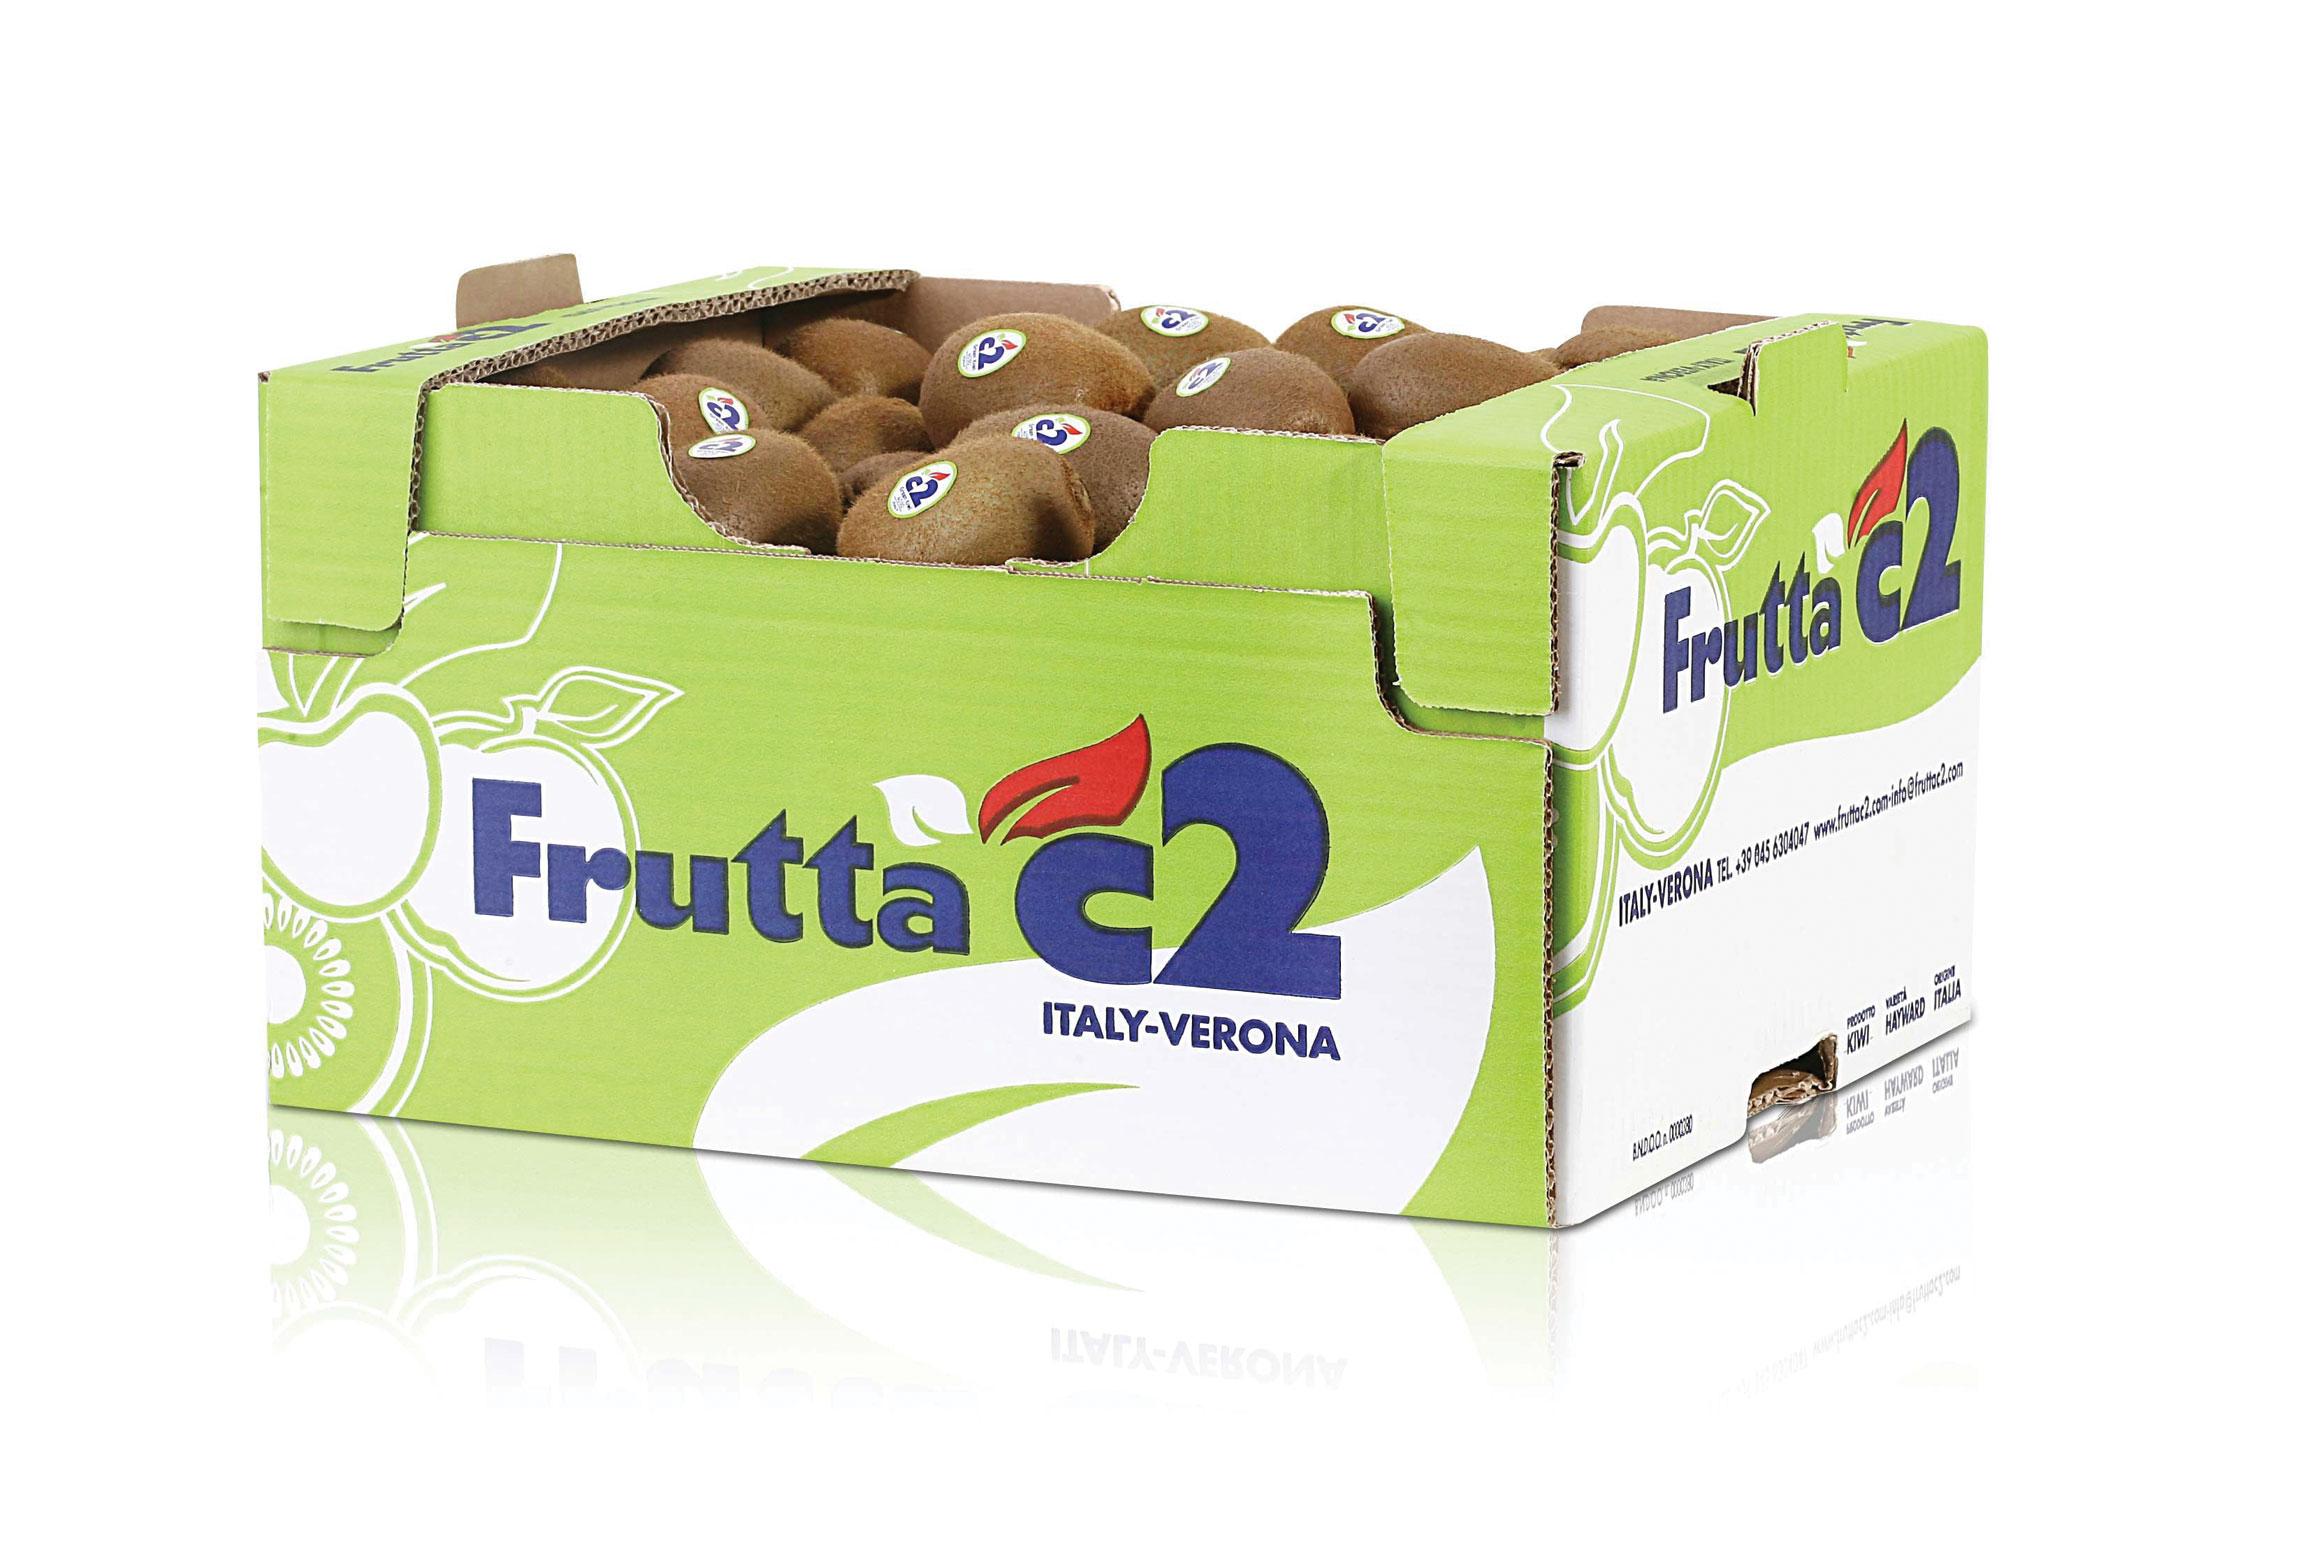 STONE-verona-frutaC2